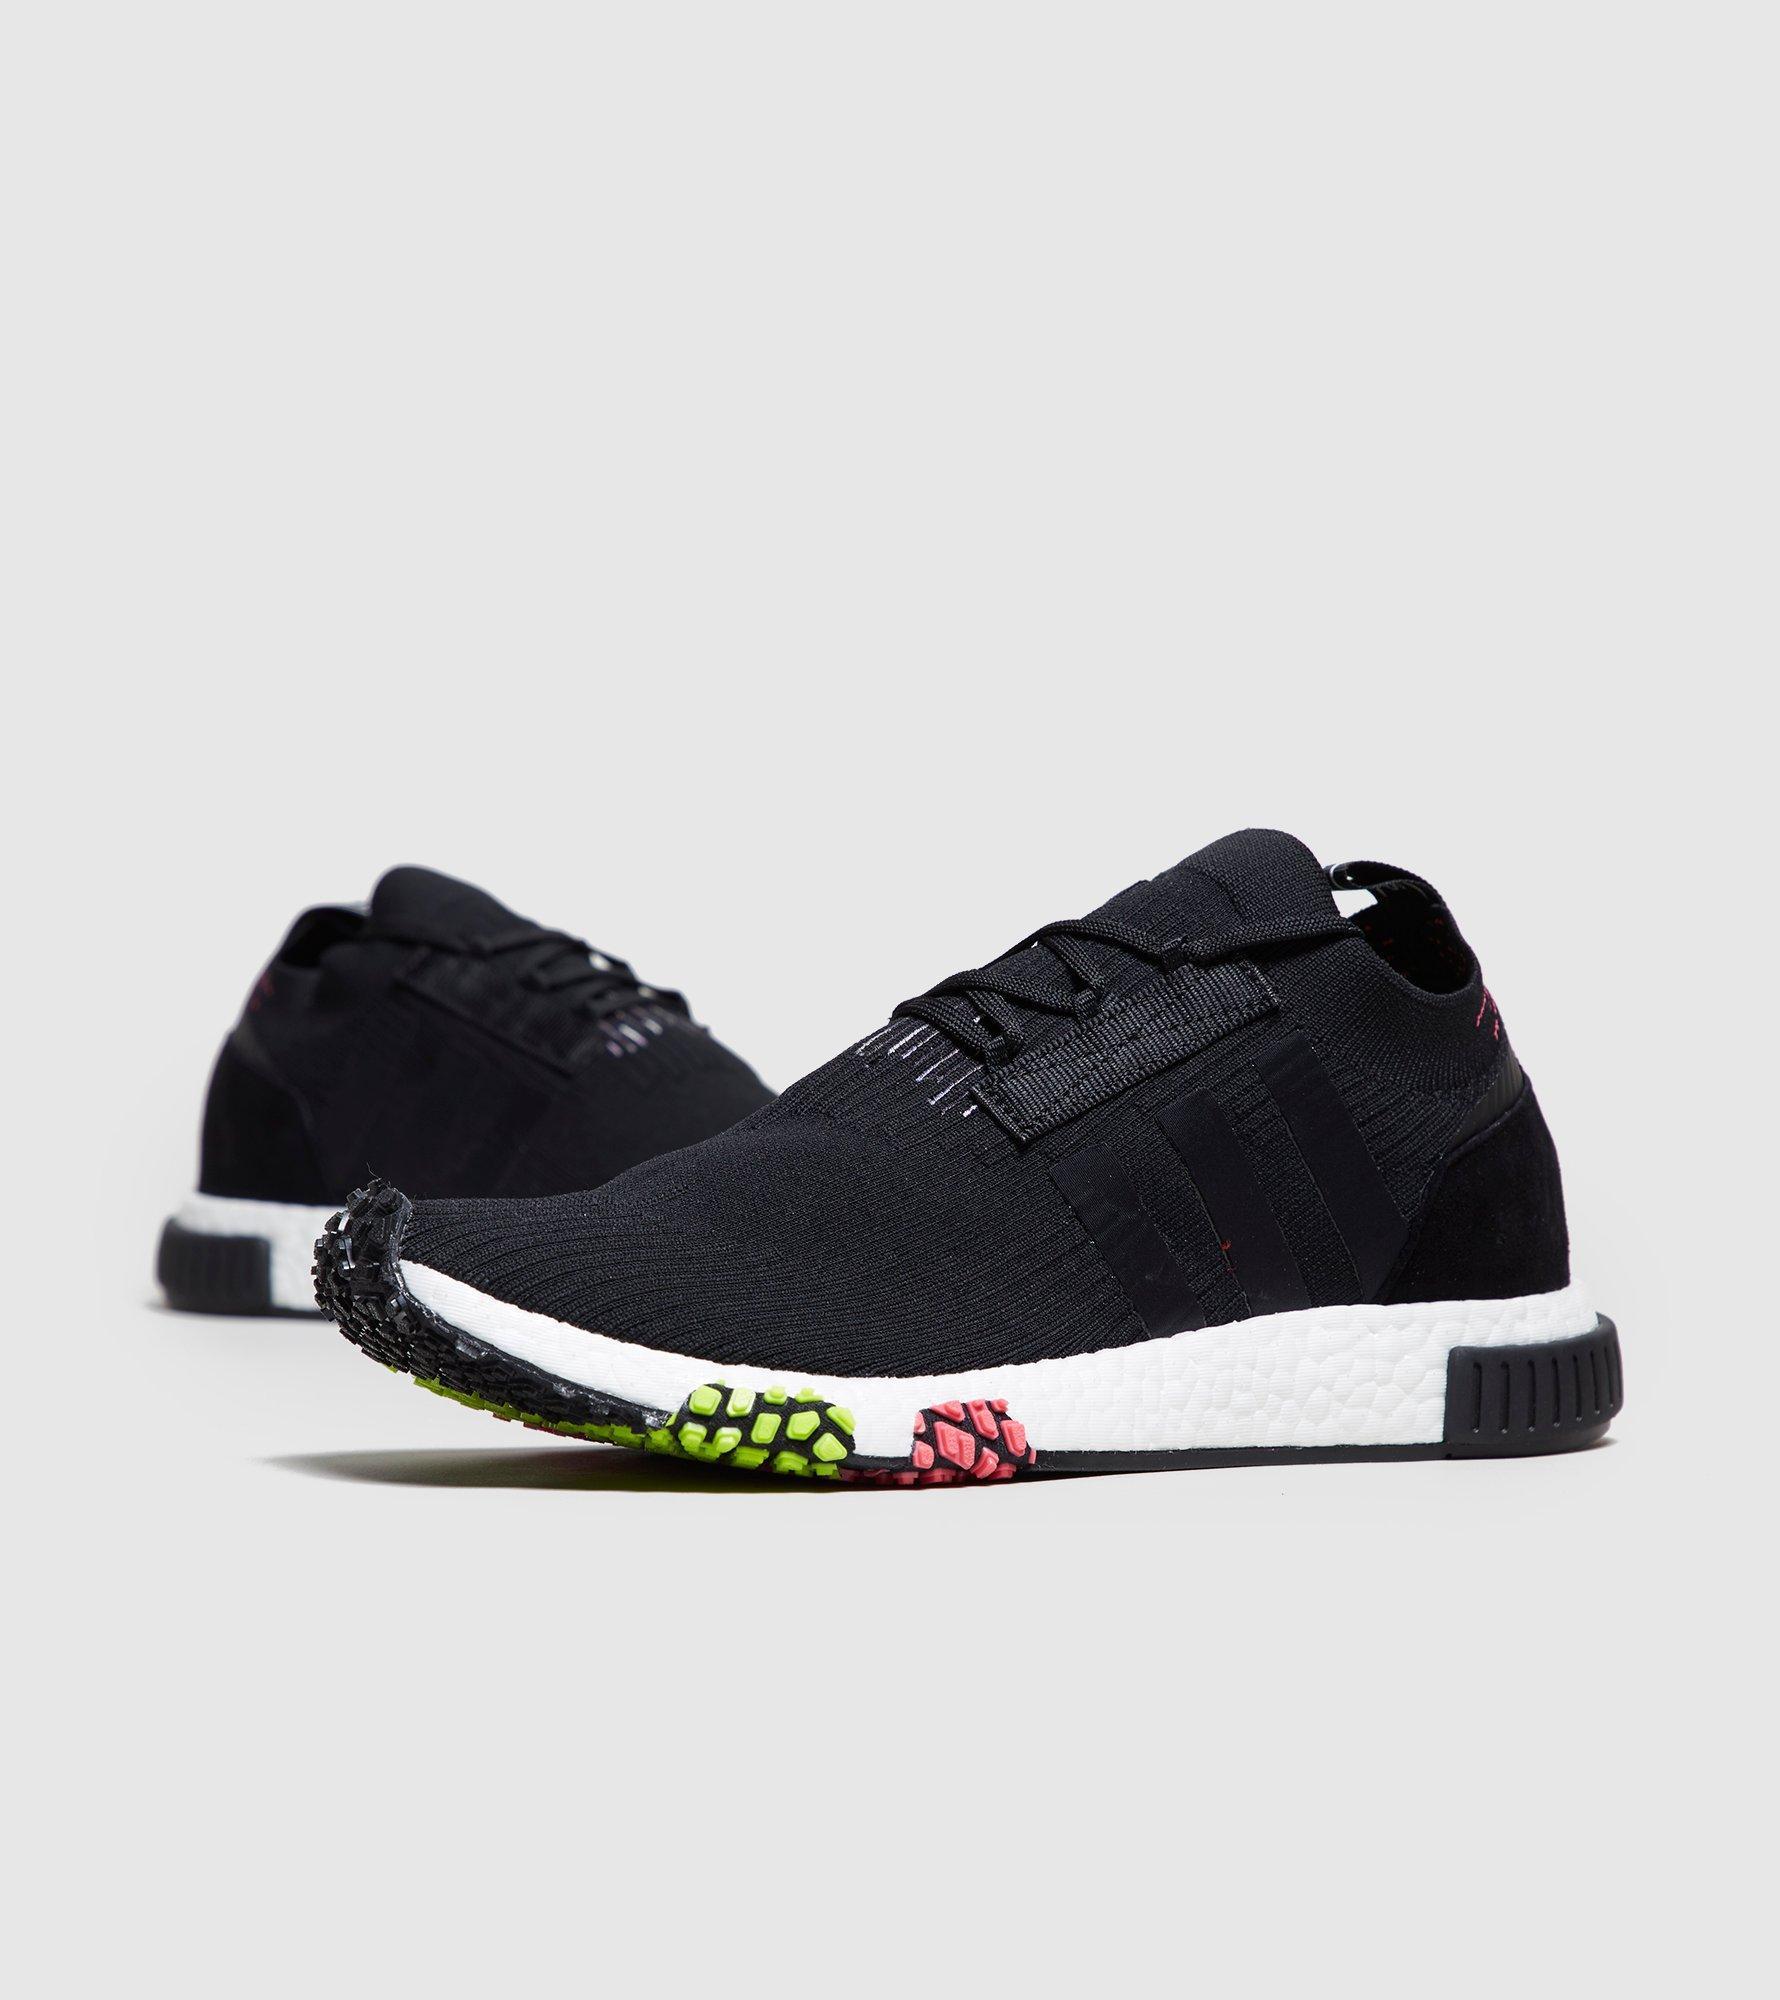 7ef6b2e1c0d7f adidas Originals Nmd Racer Primeknit in Black for Men - Lyst